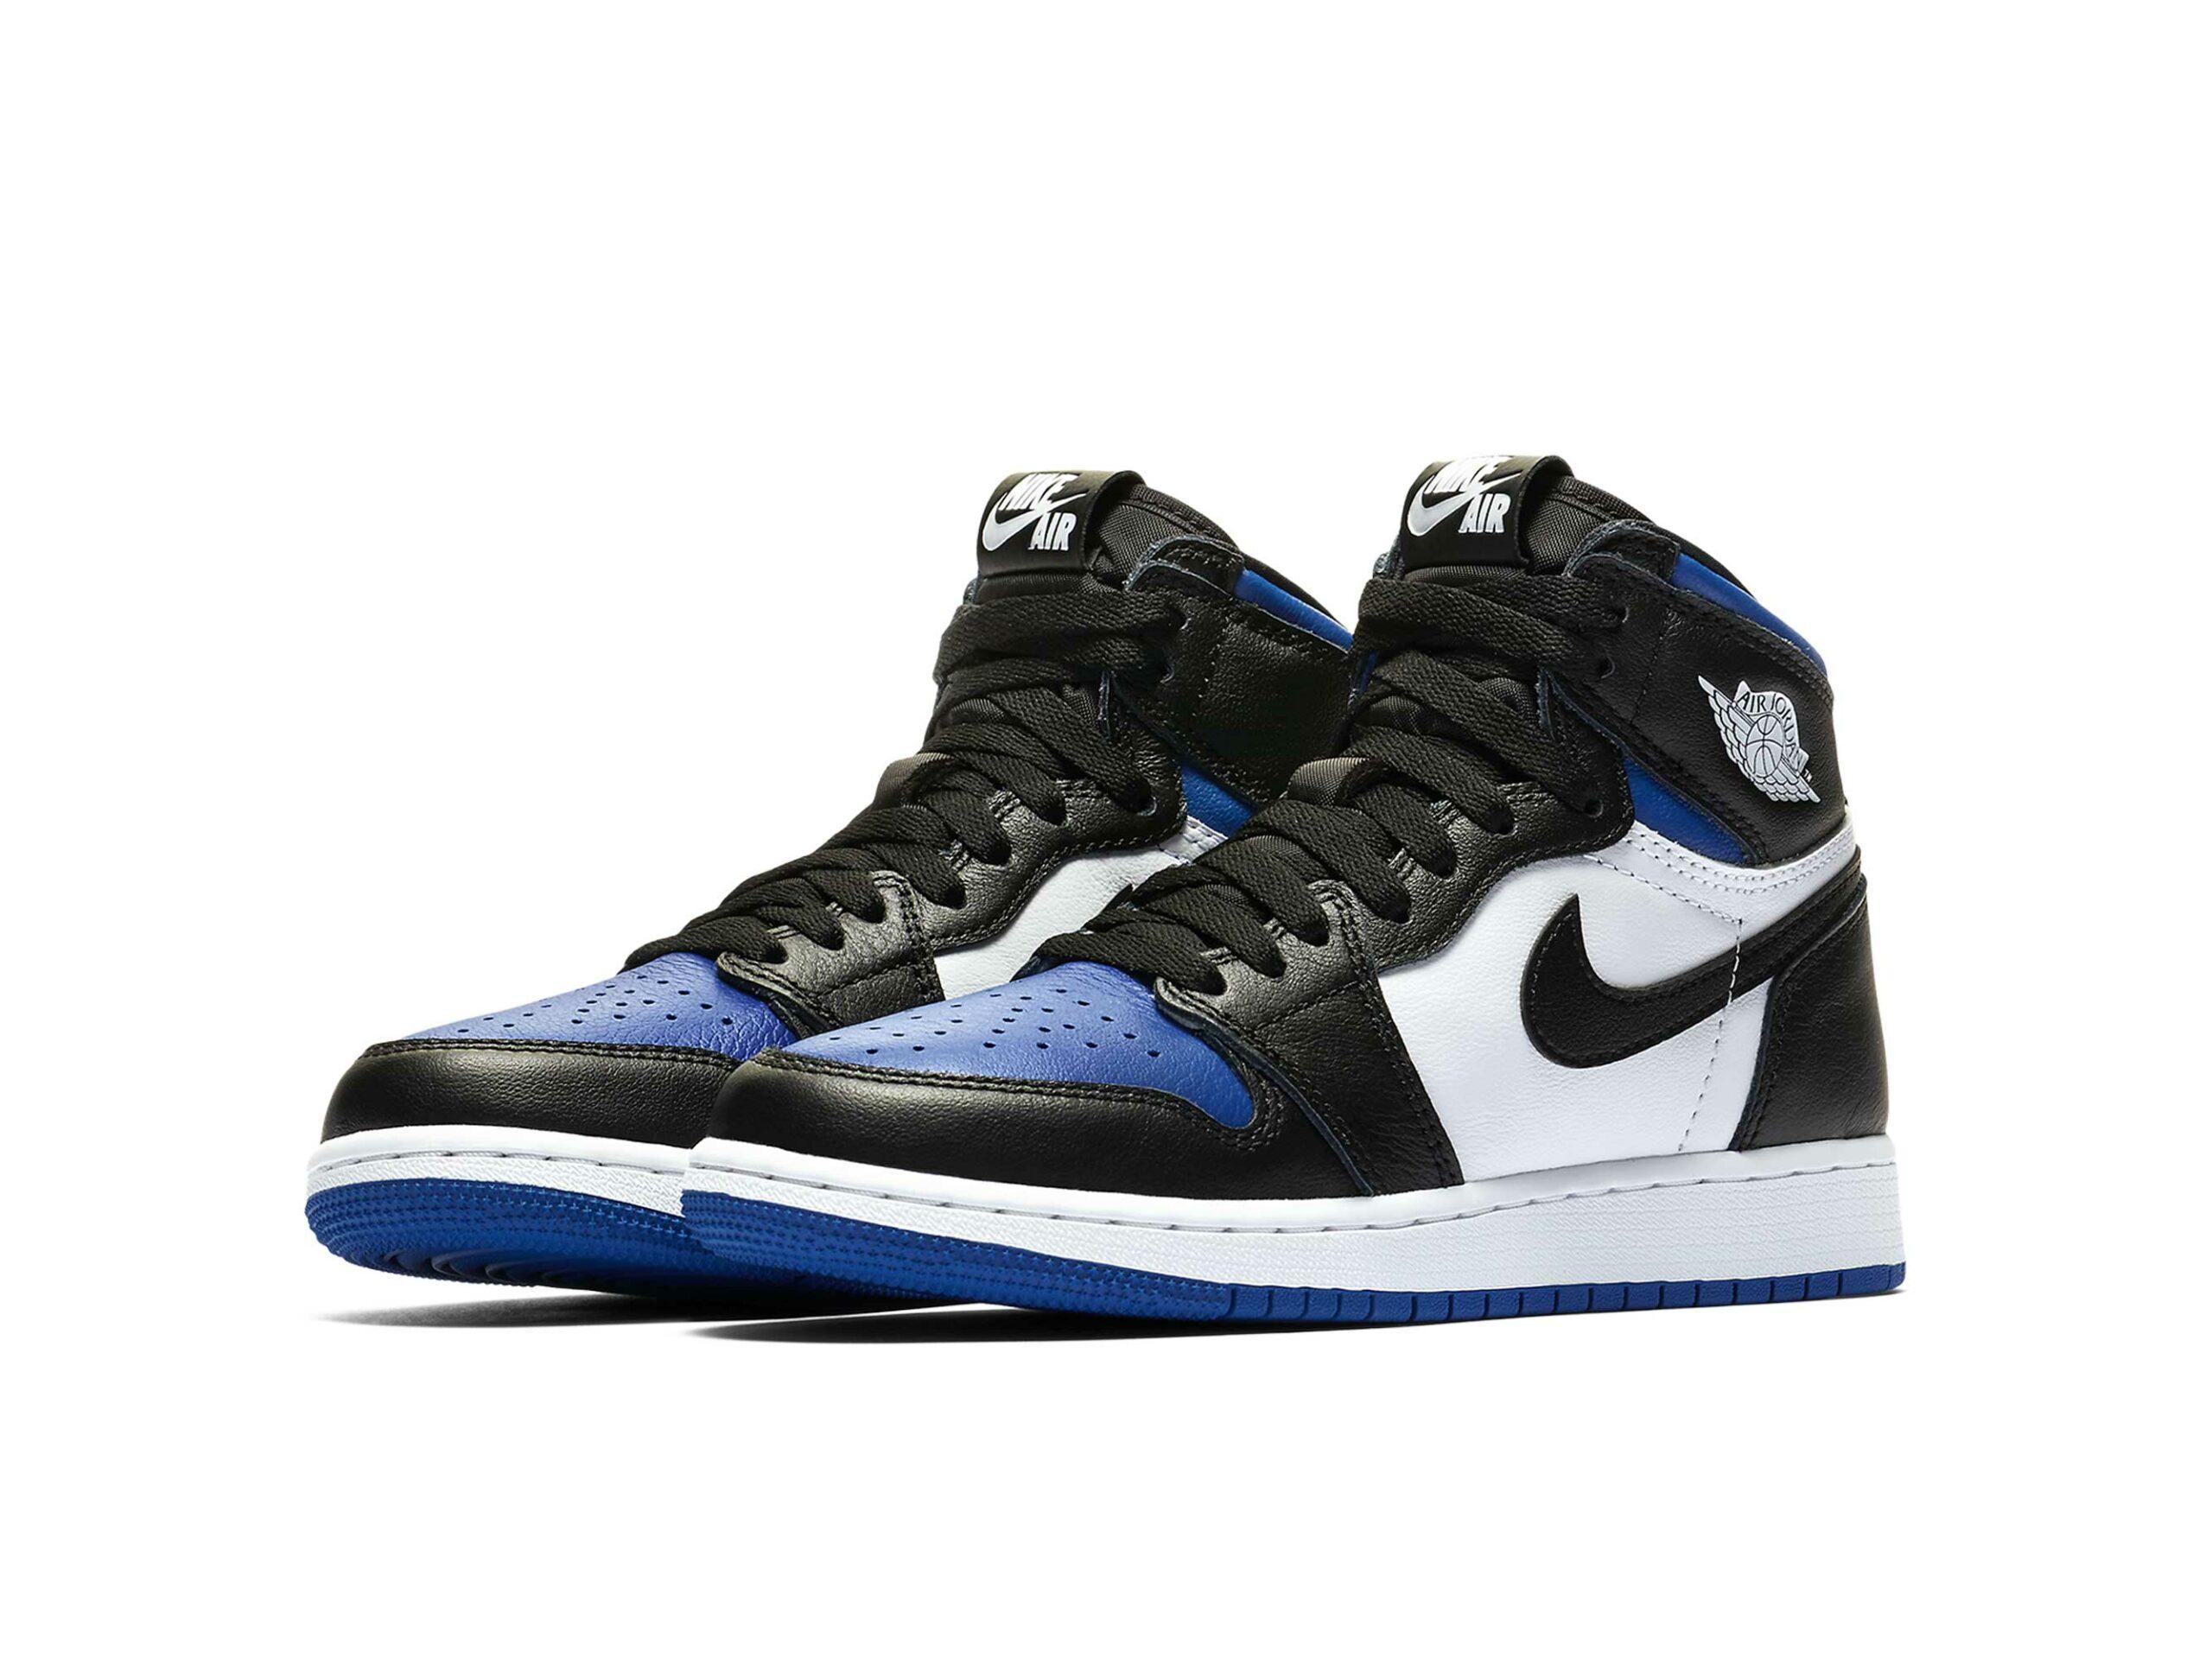 nike air Jordan 1 retro high og gs royal toe 575441_041 купить